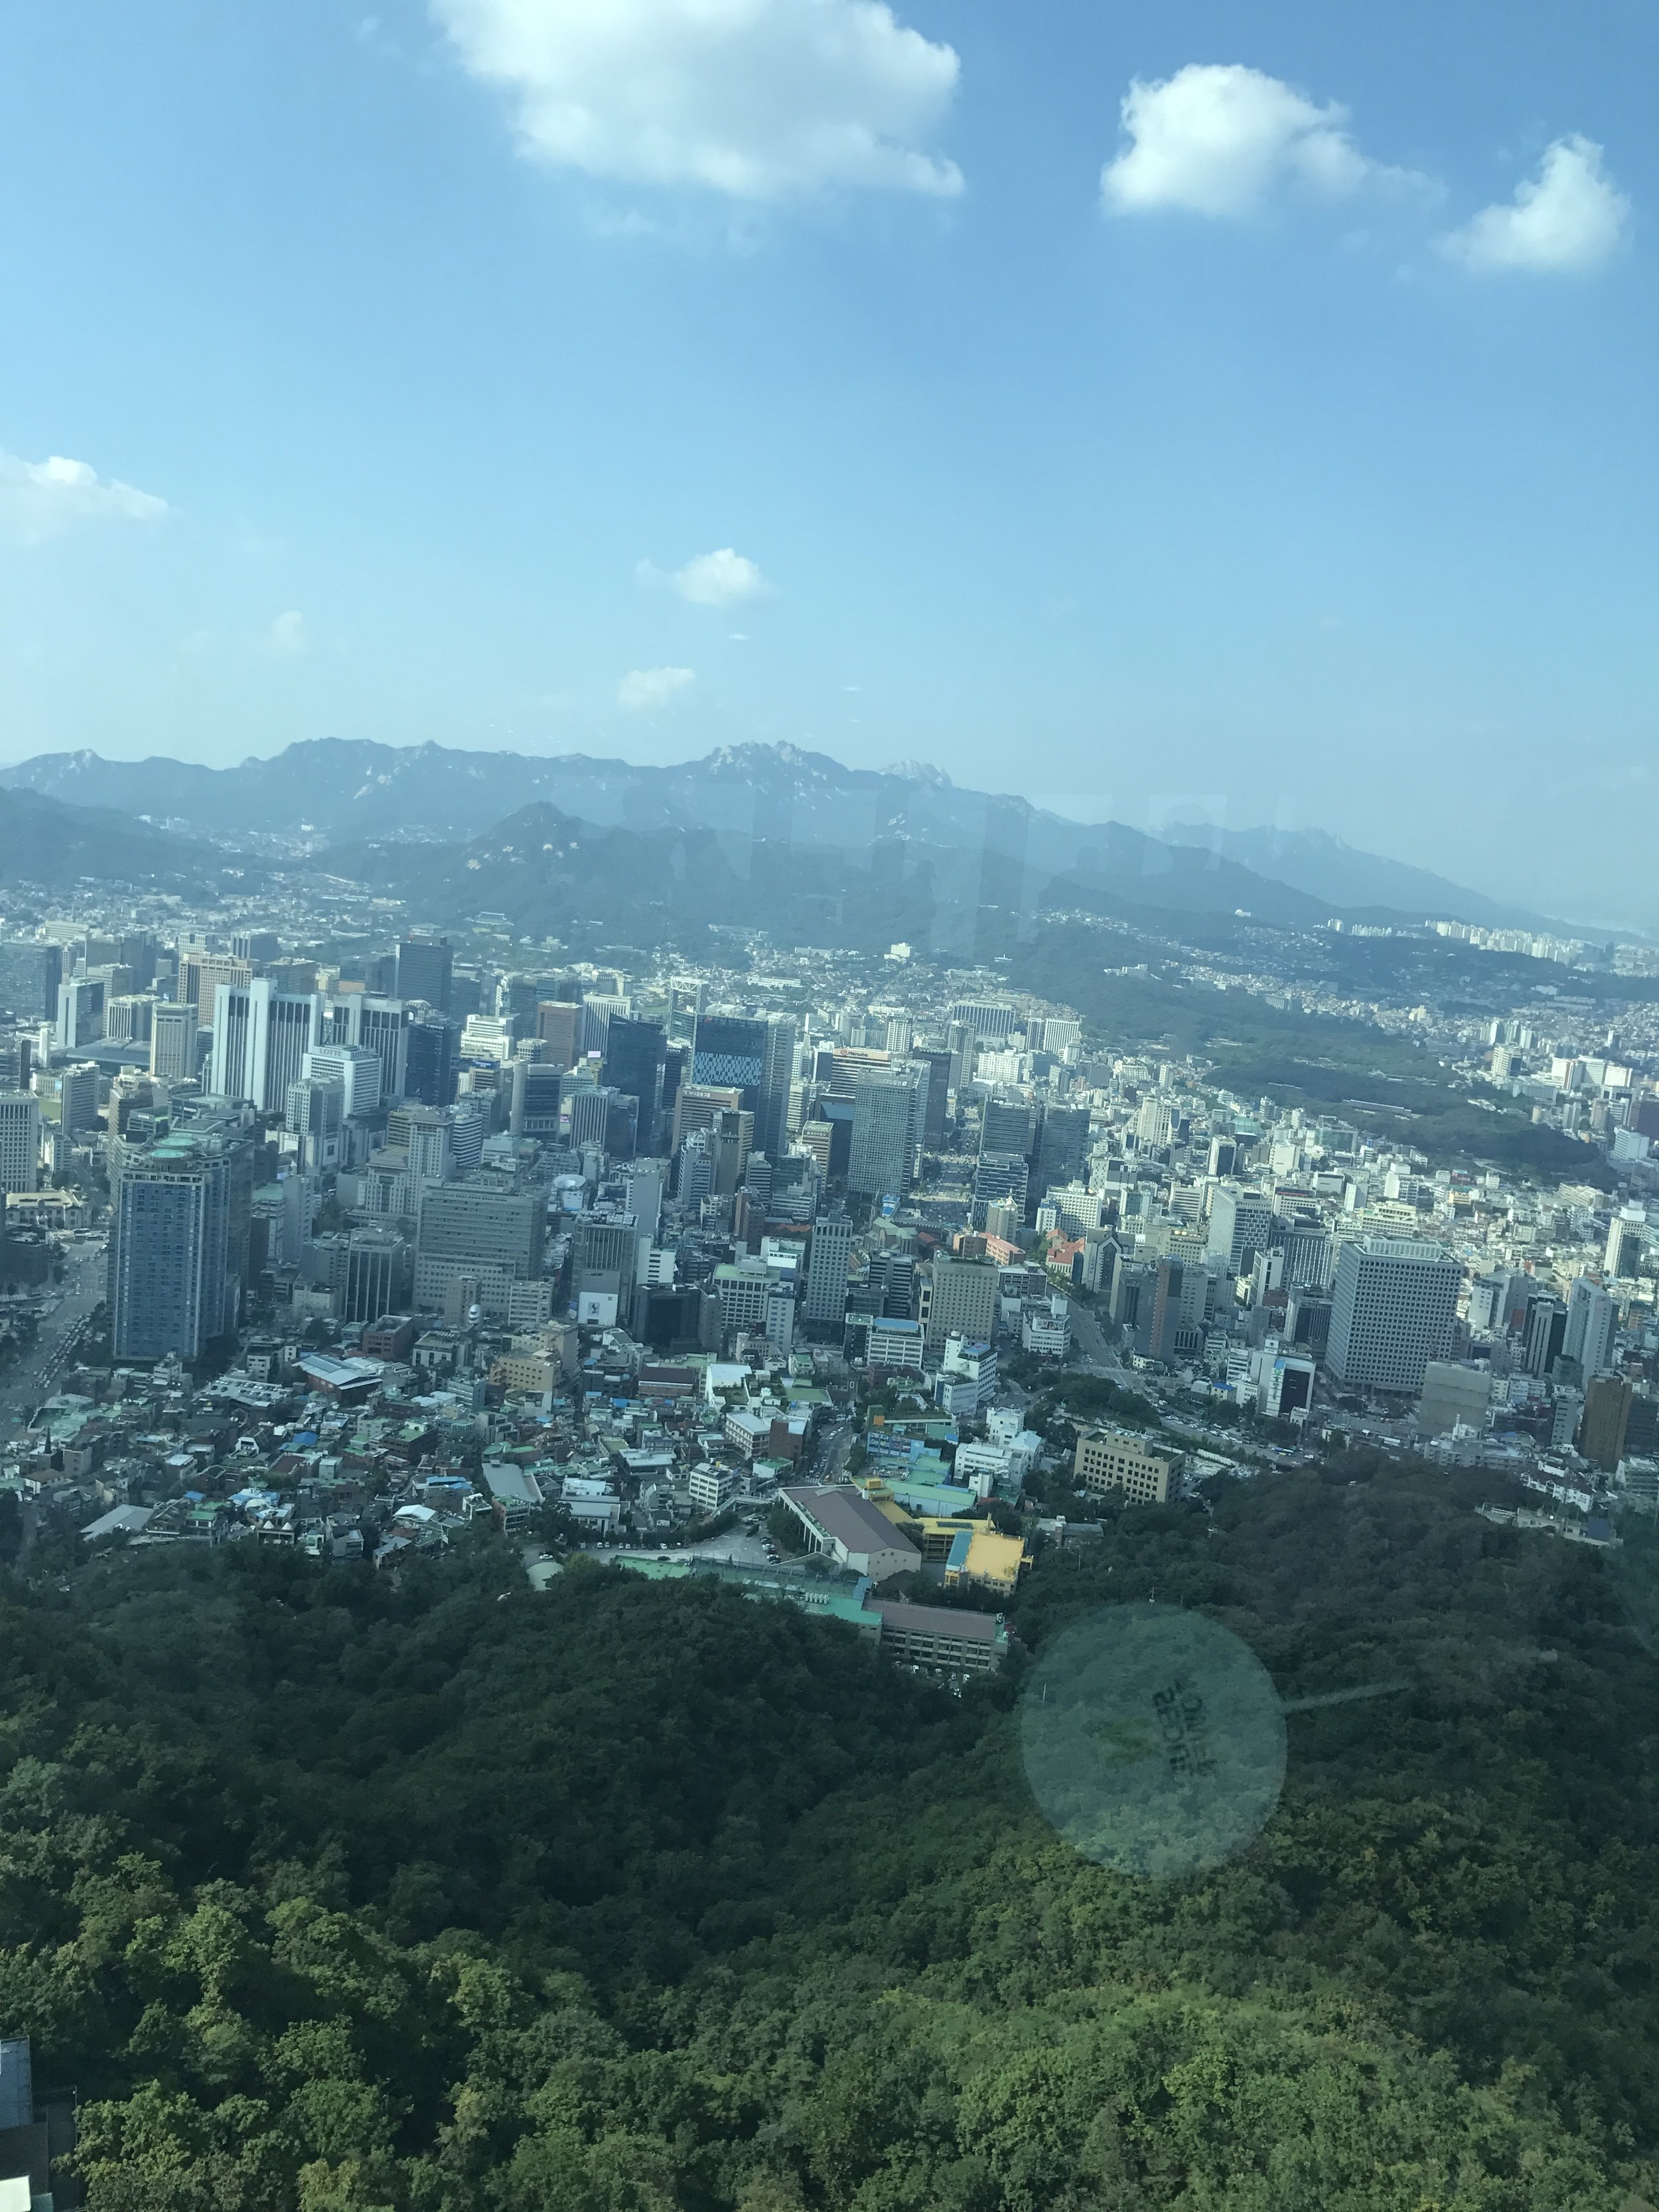 Anna Kooiman, annakooiman.com, fitness, travel, lifestyle, adventure, seoul, south korea, korea, where to go in korea, what to see in korea, what to see in Seoul, what to do in Seoul, how to plan a trip to seoul, planning a trip to seoul, plan a trip to seoul, top destinations in korea, dmv, jogyesa, palace, temple, intercontinental, hotels, IHG, COEX